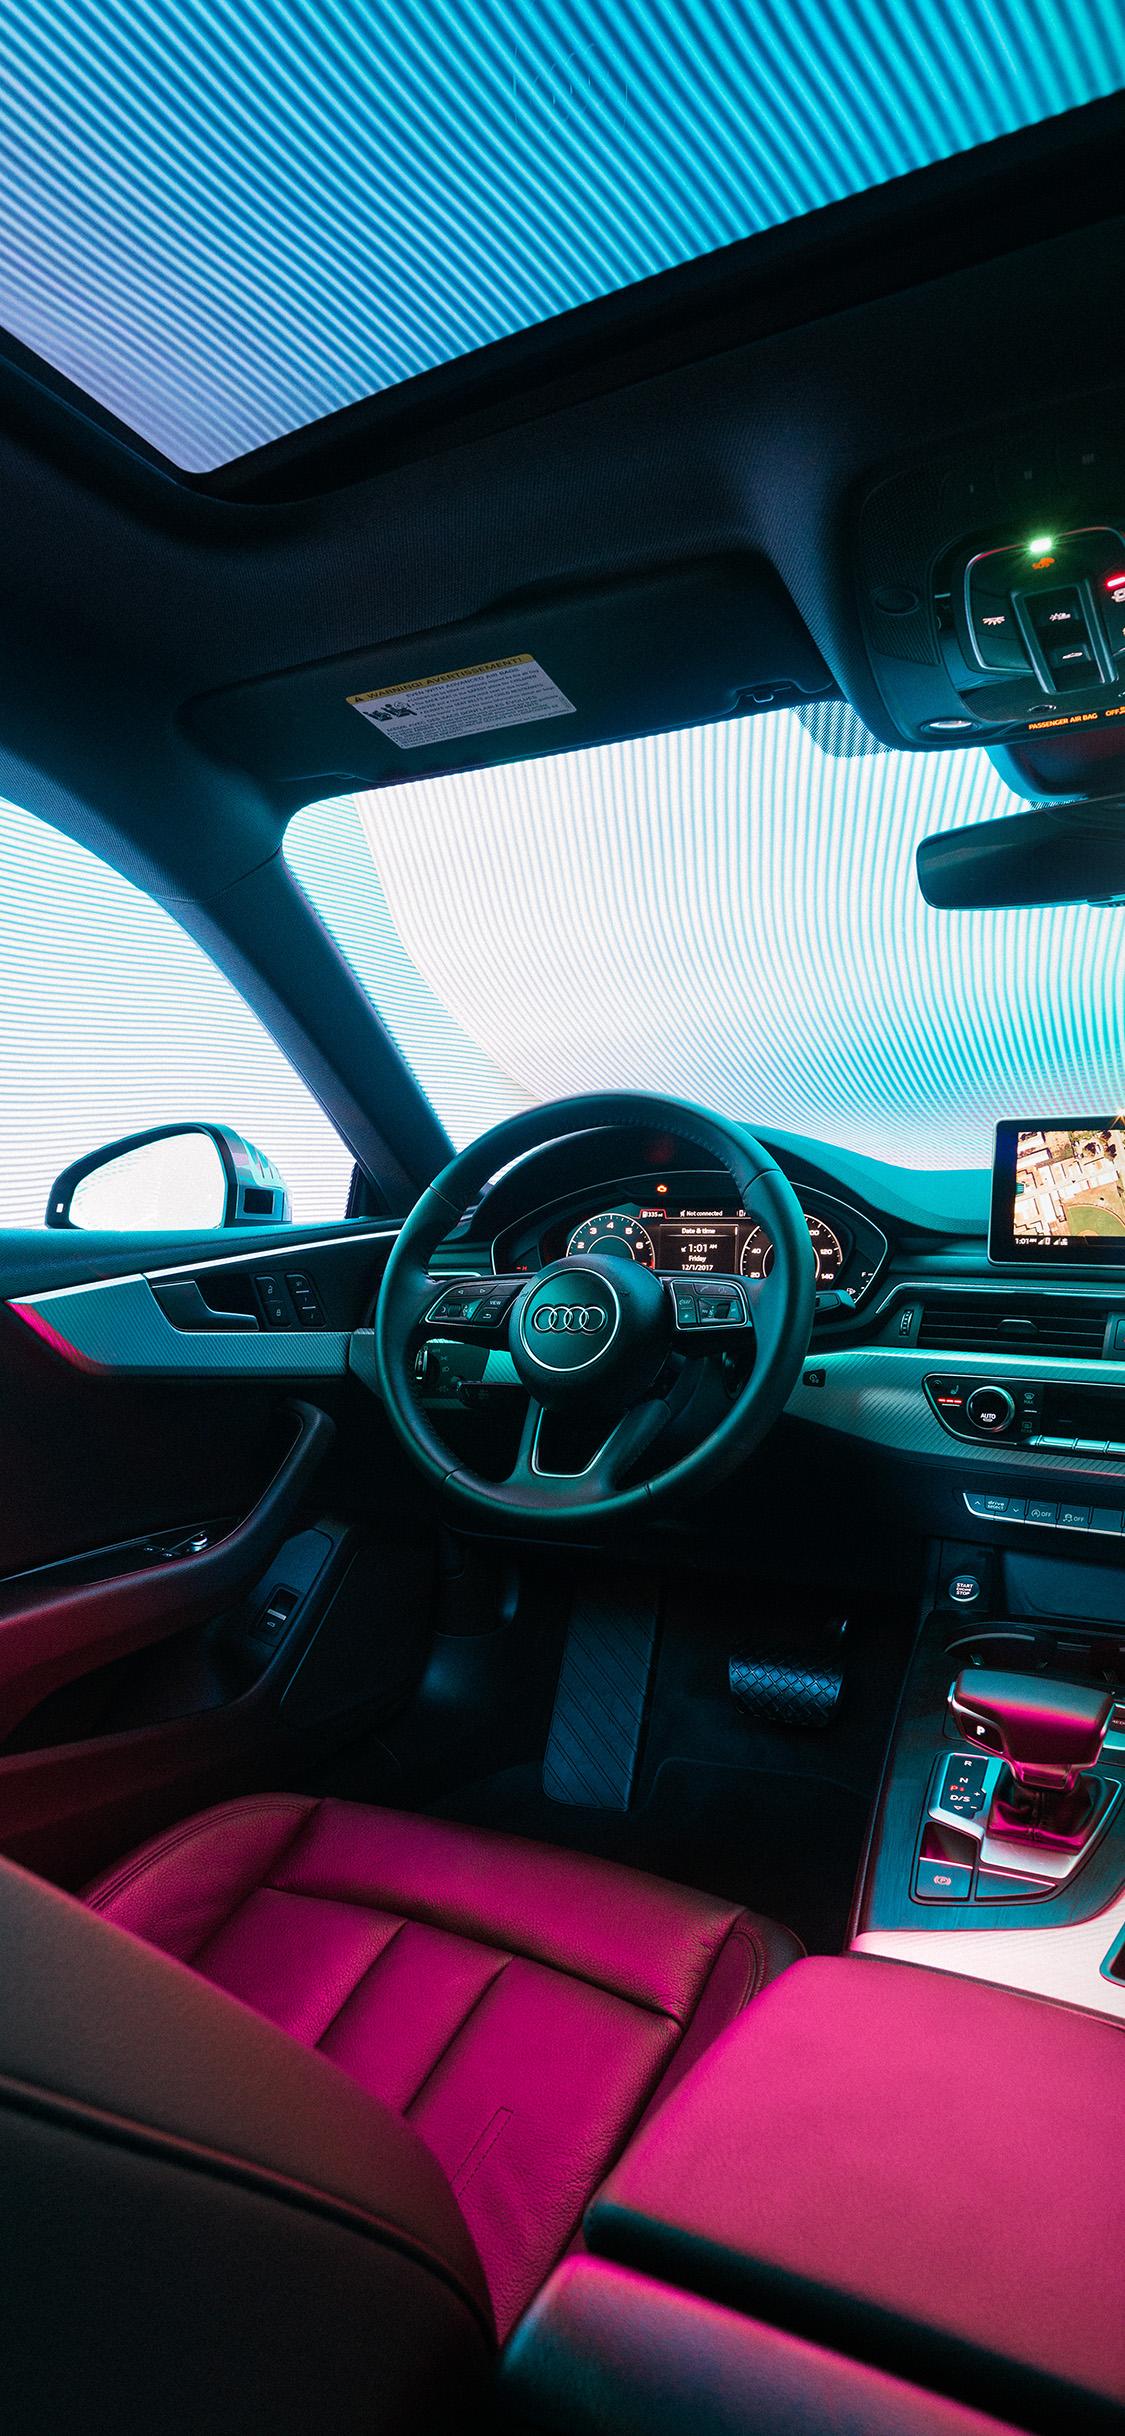 iPhonexpapers.com-Apple-iPhone-wallpaper-be58-car-interior-drive-art-illustration